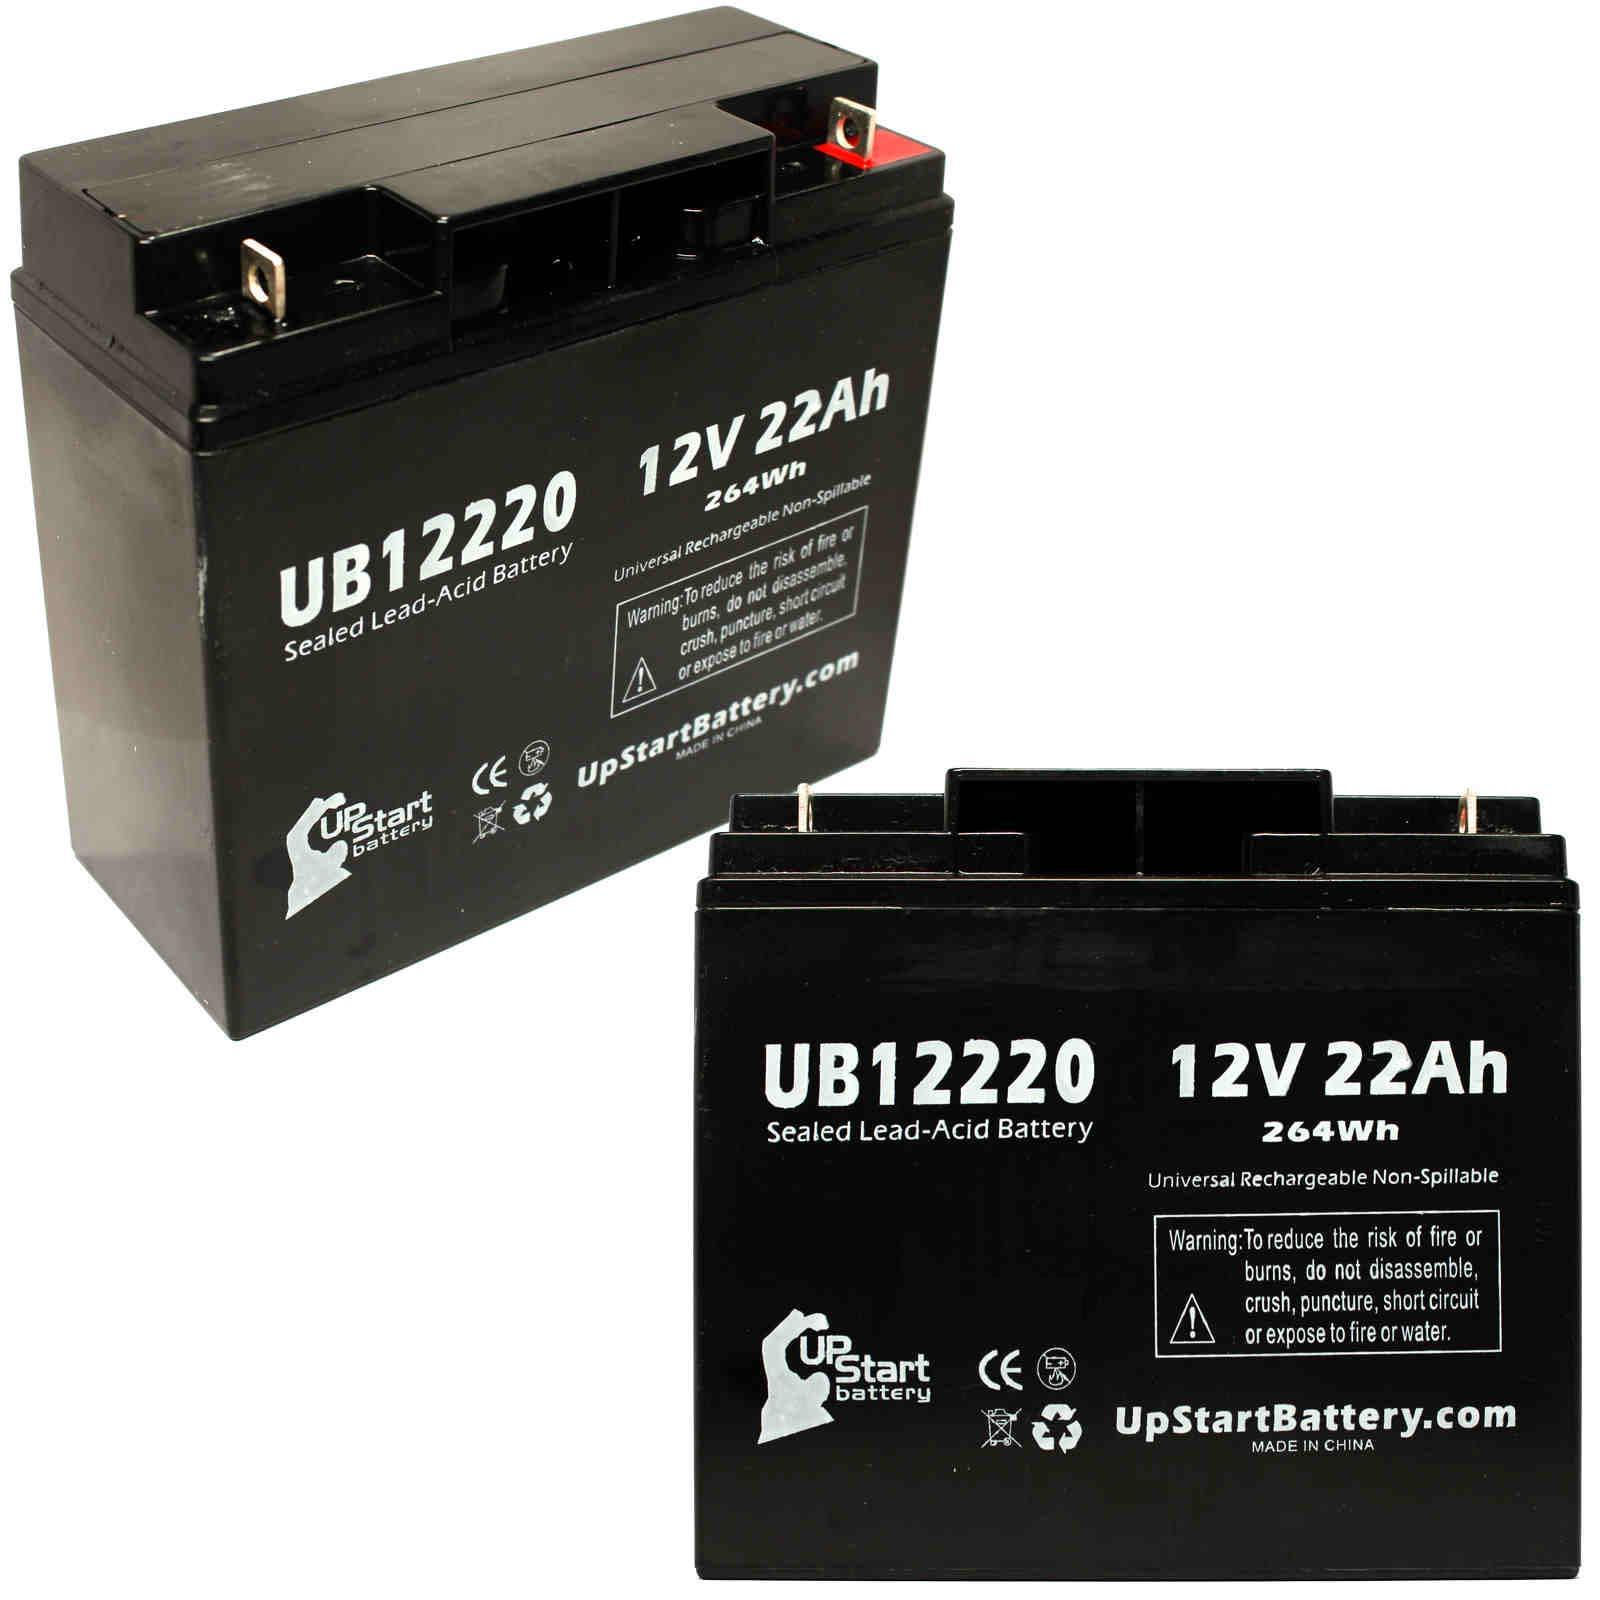 2x Pack - Panasonic LC-RD1217P Battery Replacement - UB12220 Universal Sealed Lead Acid Battery (12V, 22Ah, 22000mAh, T4 Terminal, AGM, SLA) - image 4 de 4